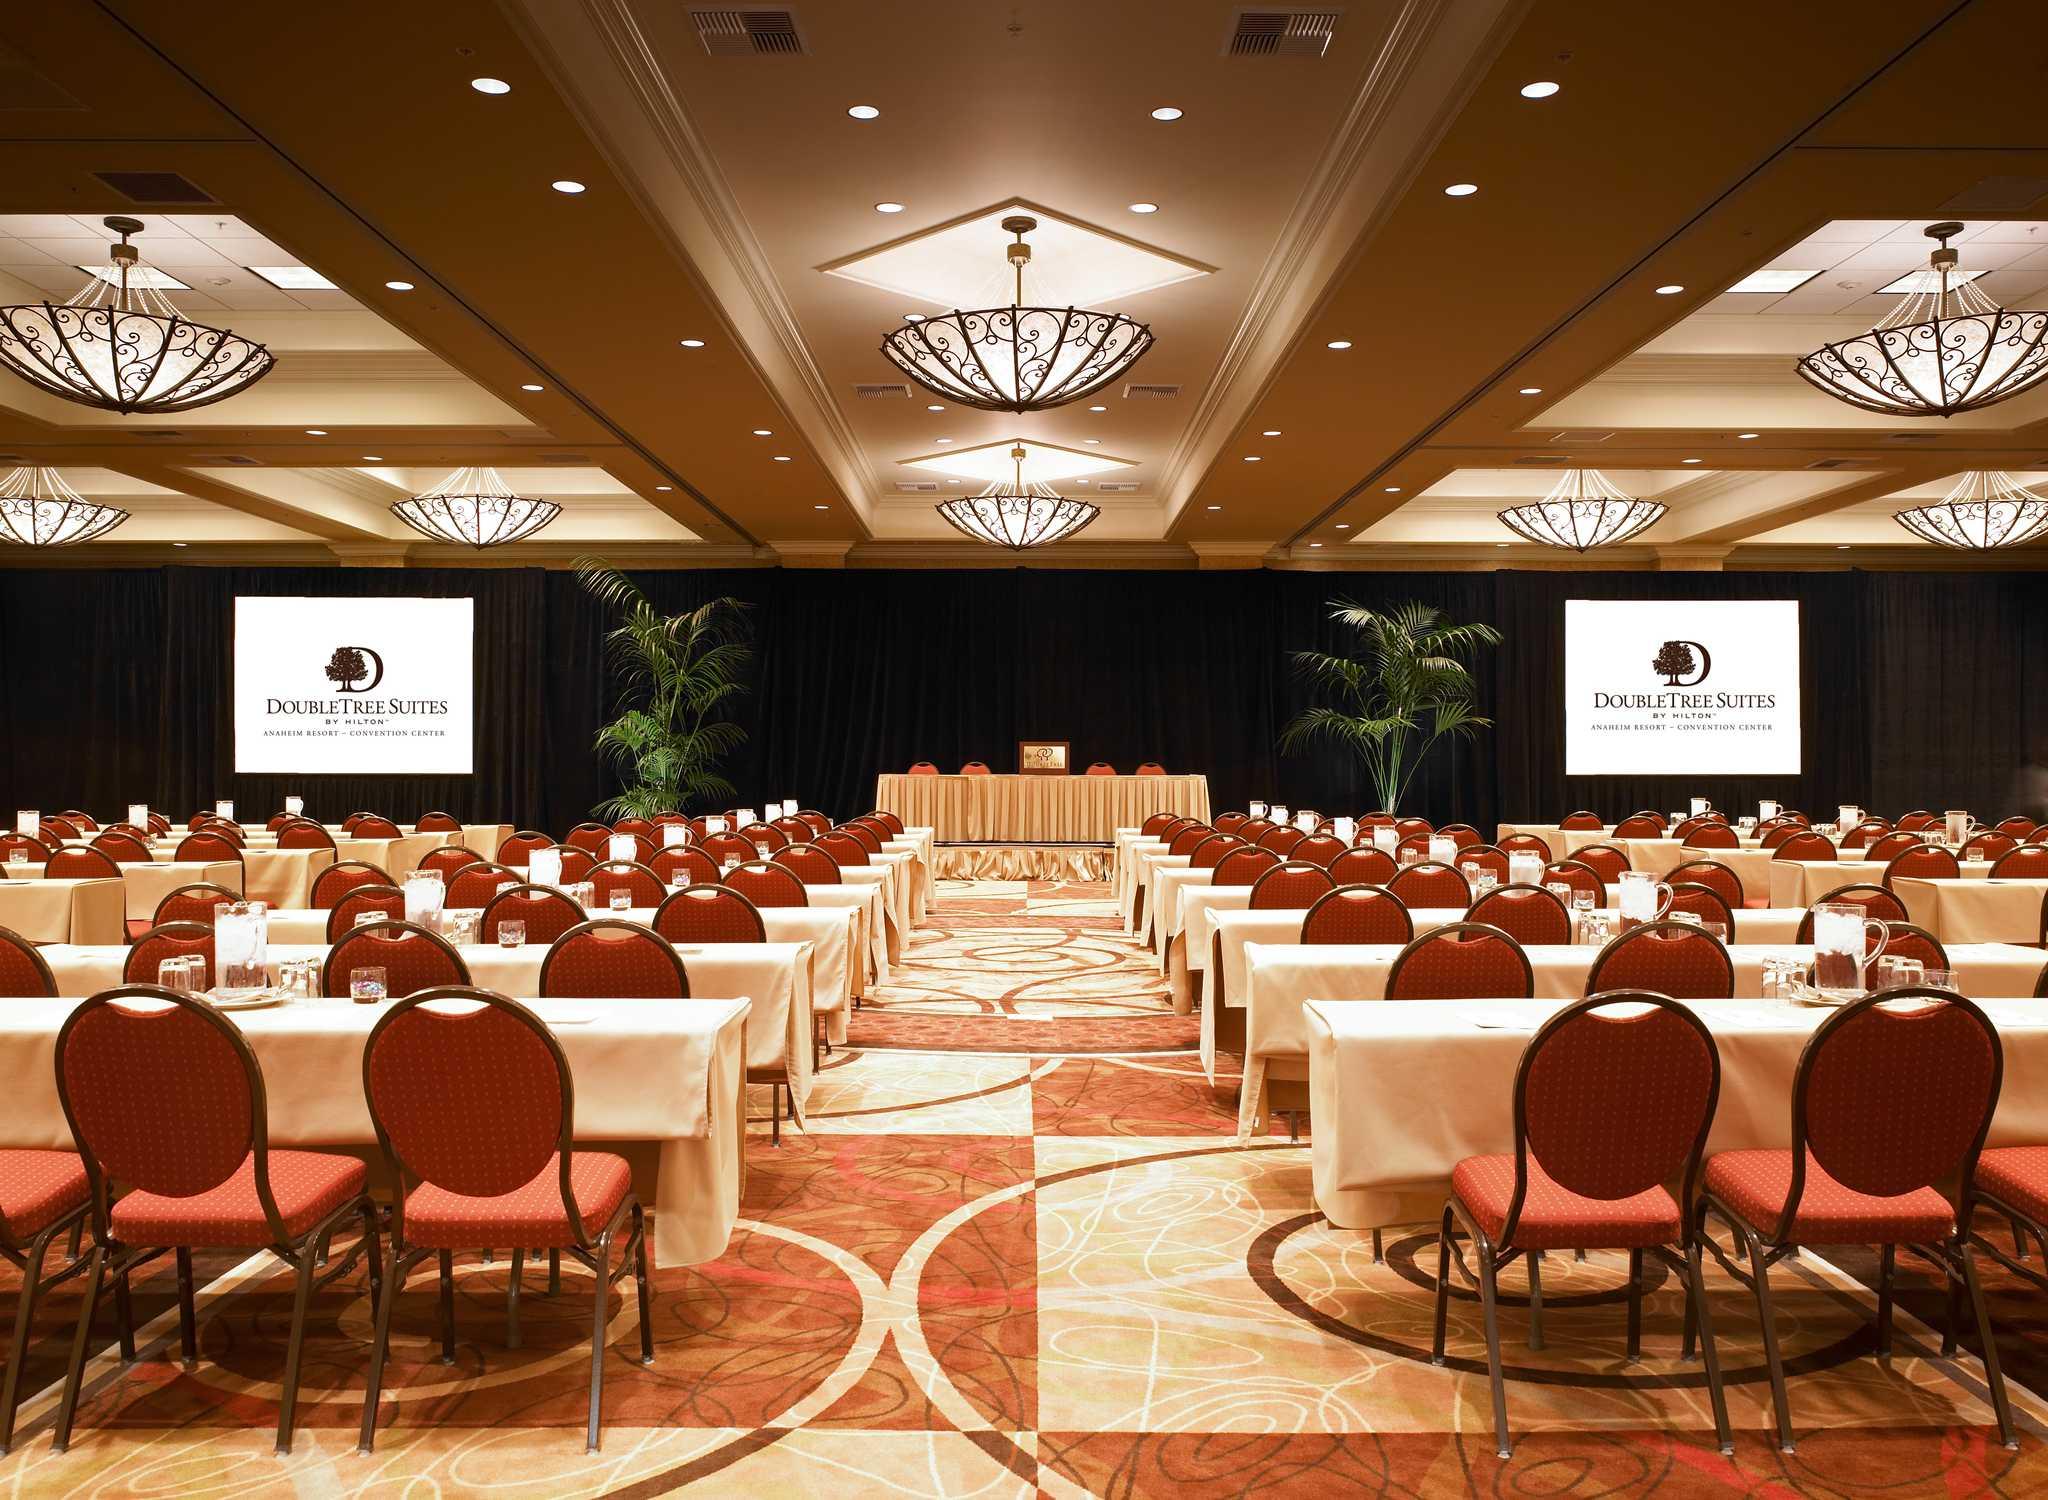 hotel doubletree suites anaheim convention center. Black Bedroom Furniture Sets. Home Design Ideas